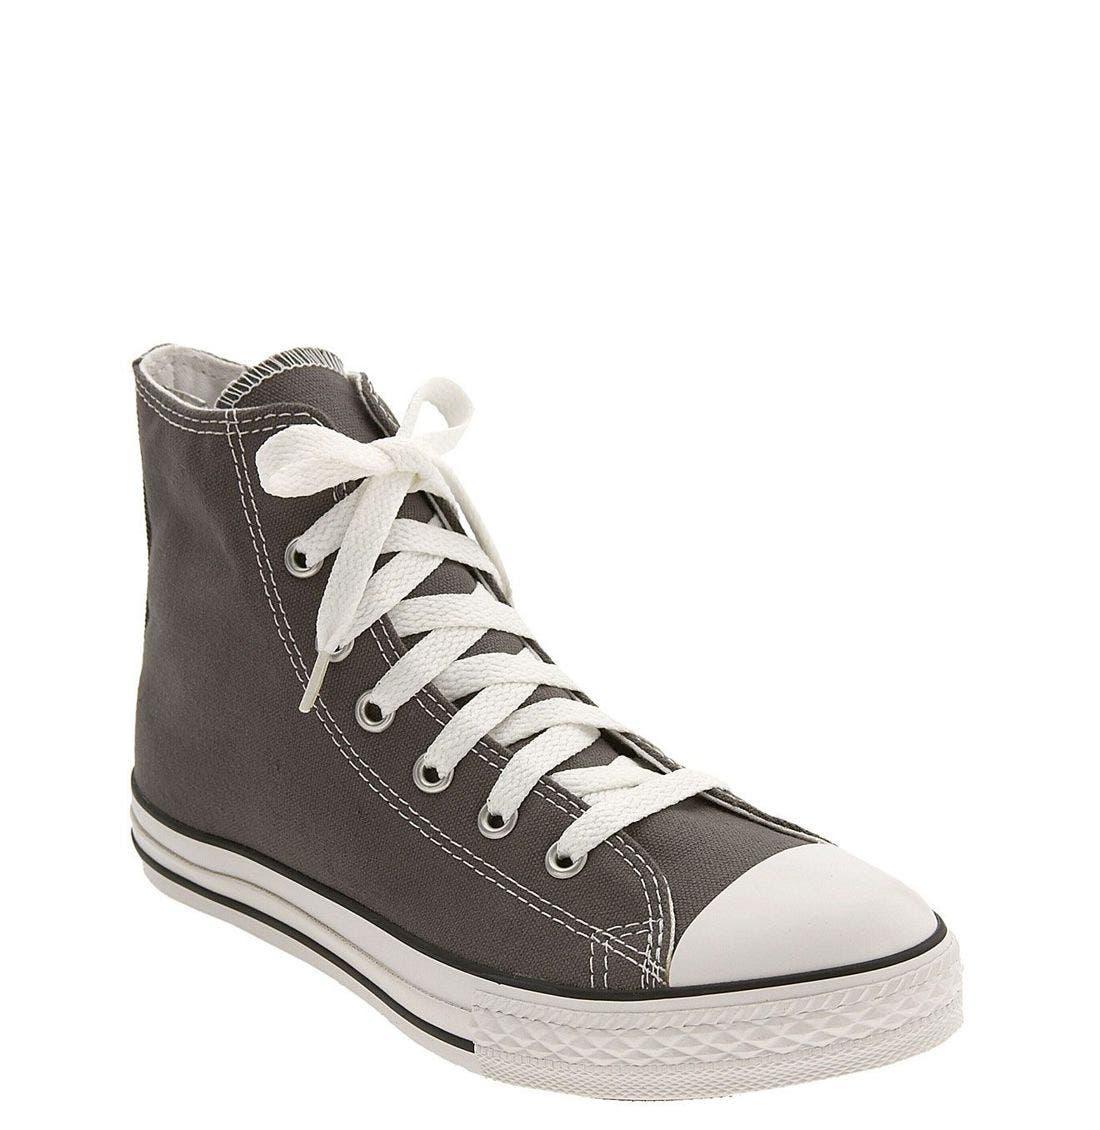 Alternate Image 1 Selected - Converse Chuck Taylor® High Top Sneaker (Baby, Walker & Toddler)